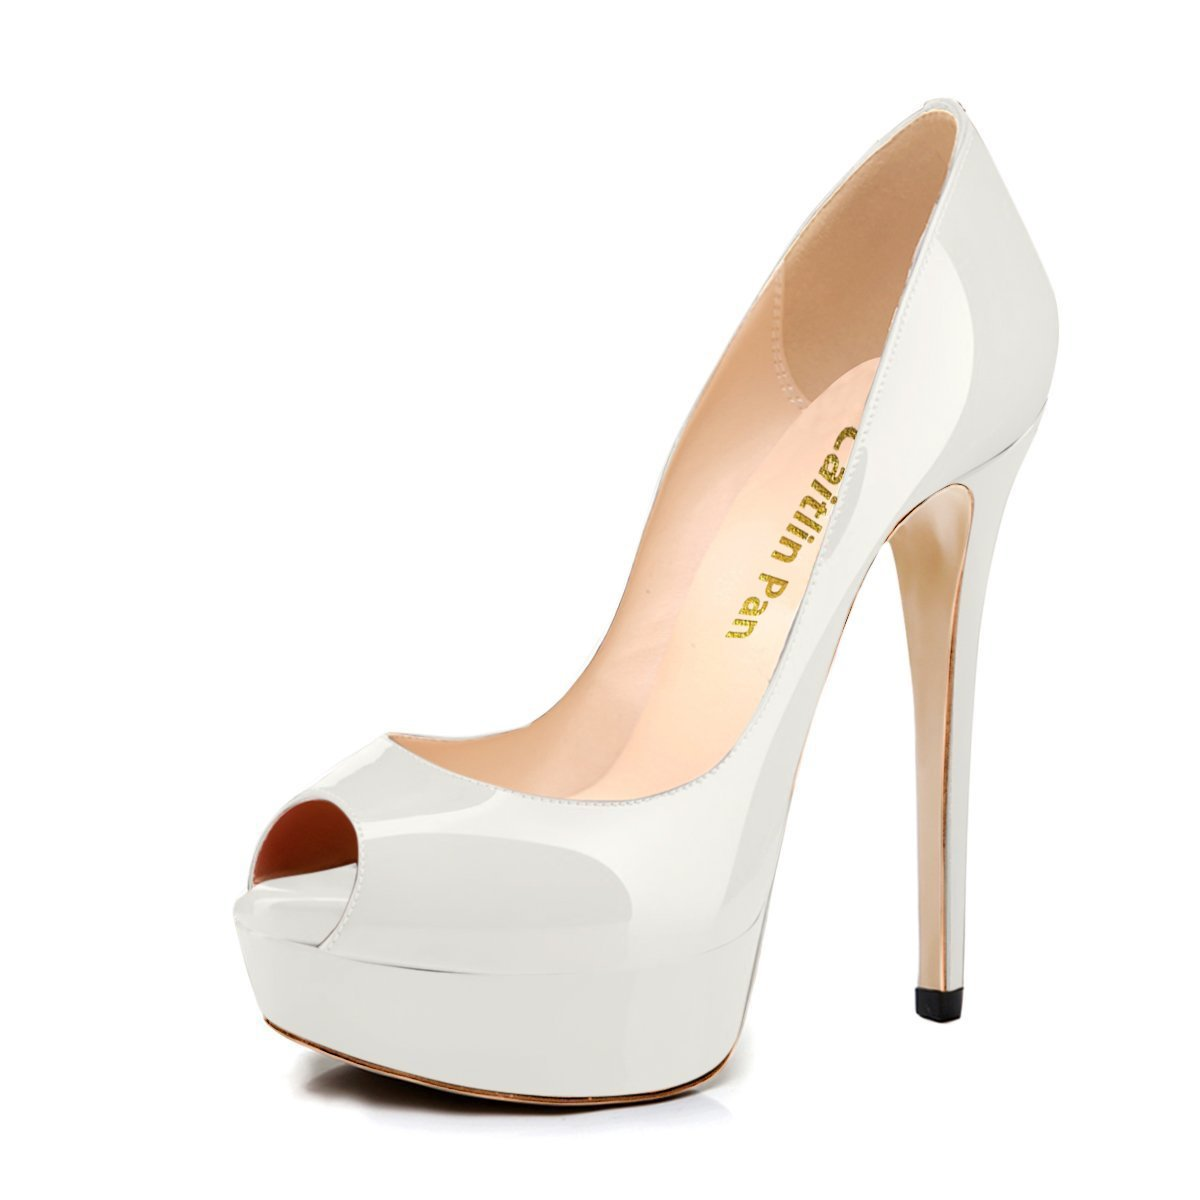 Caitlin Pan Womens Peep Toe Pumps Platform Stiletto Sandals High Heels Slip On Dress Pumps 5-14 US B07FCJMC8P 5 M US|White/Red B0tt0m